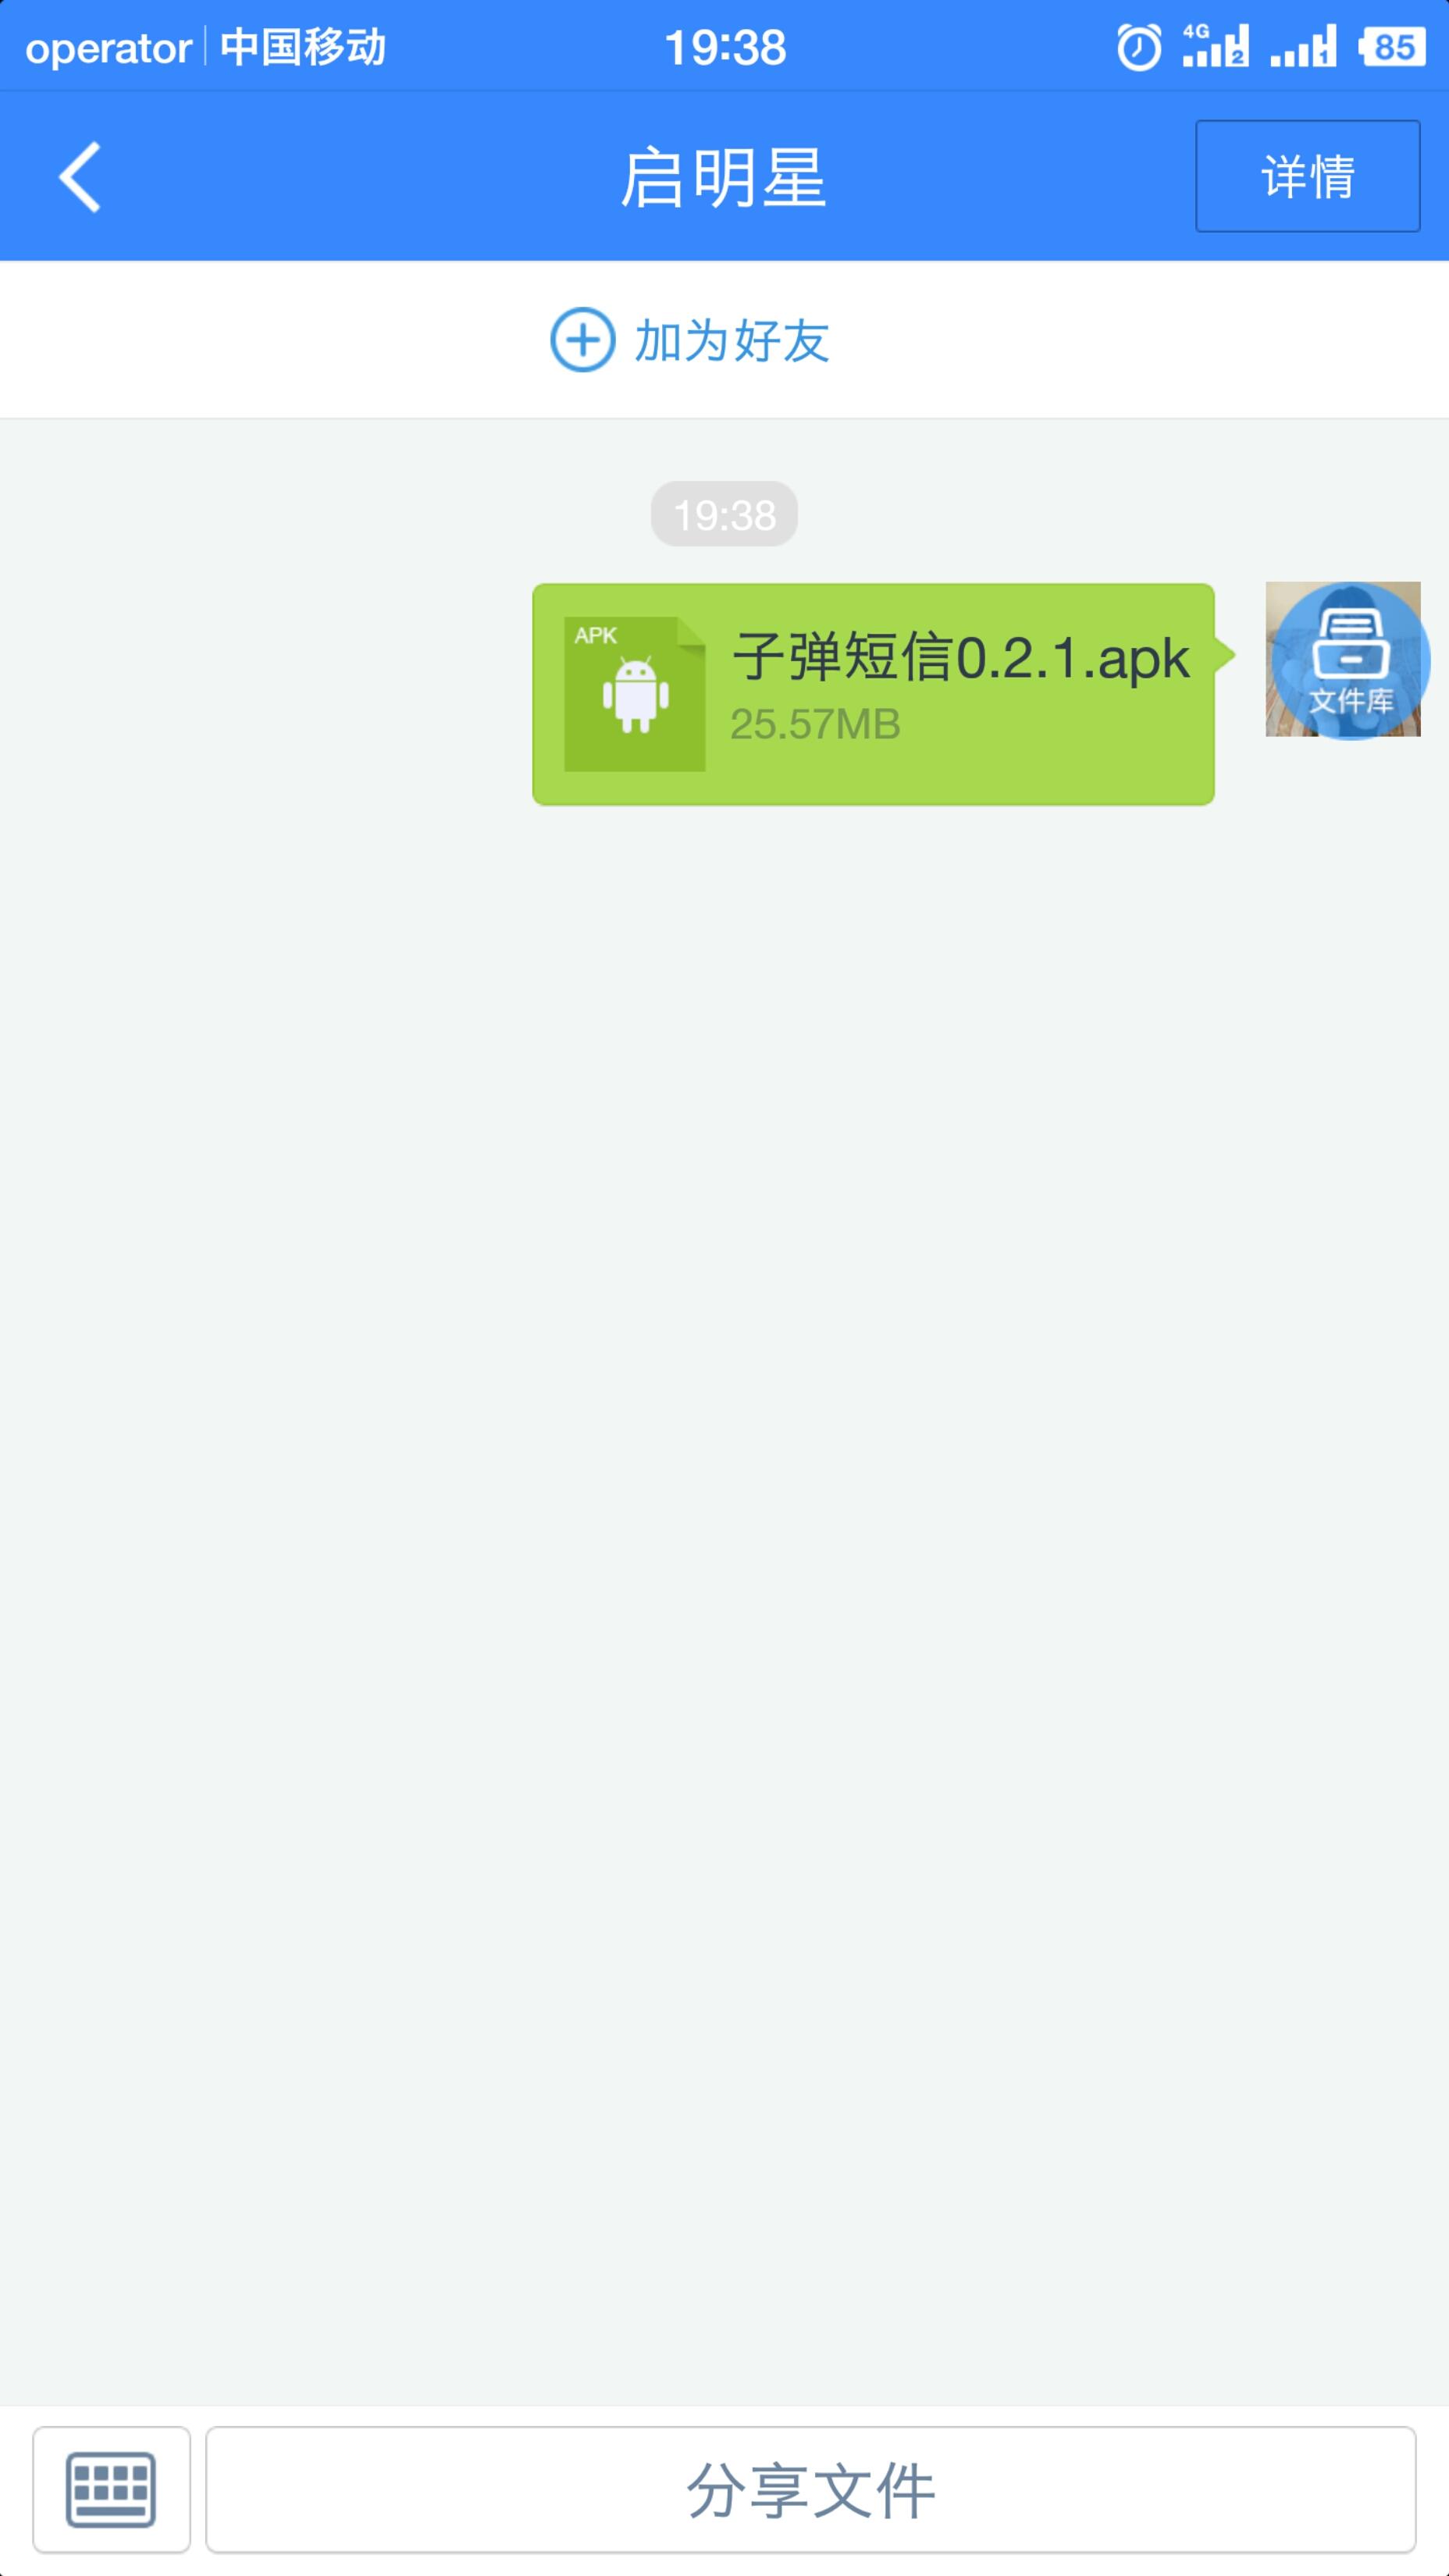 Screenshot_2018-06-12-19-38-47-522_????.png